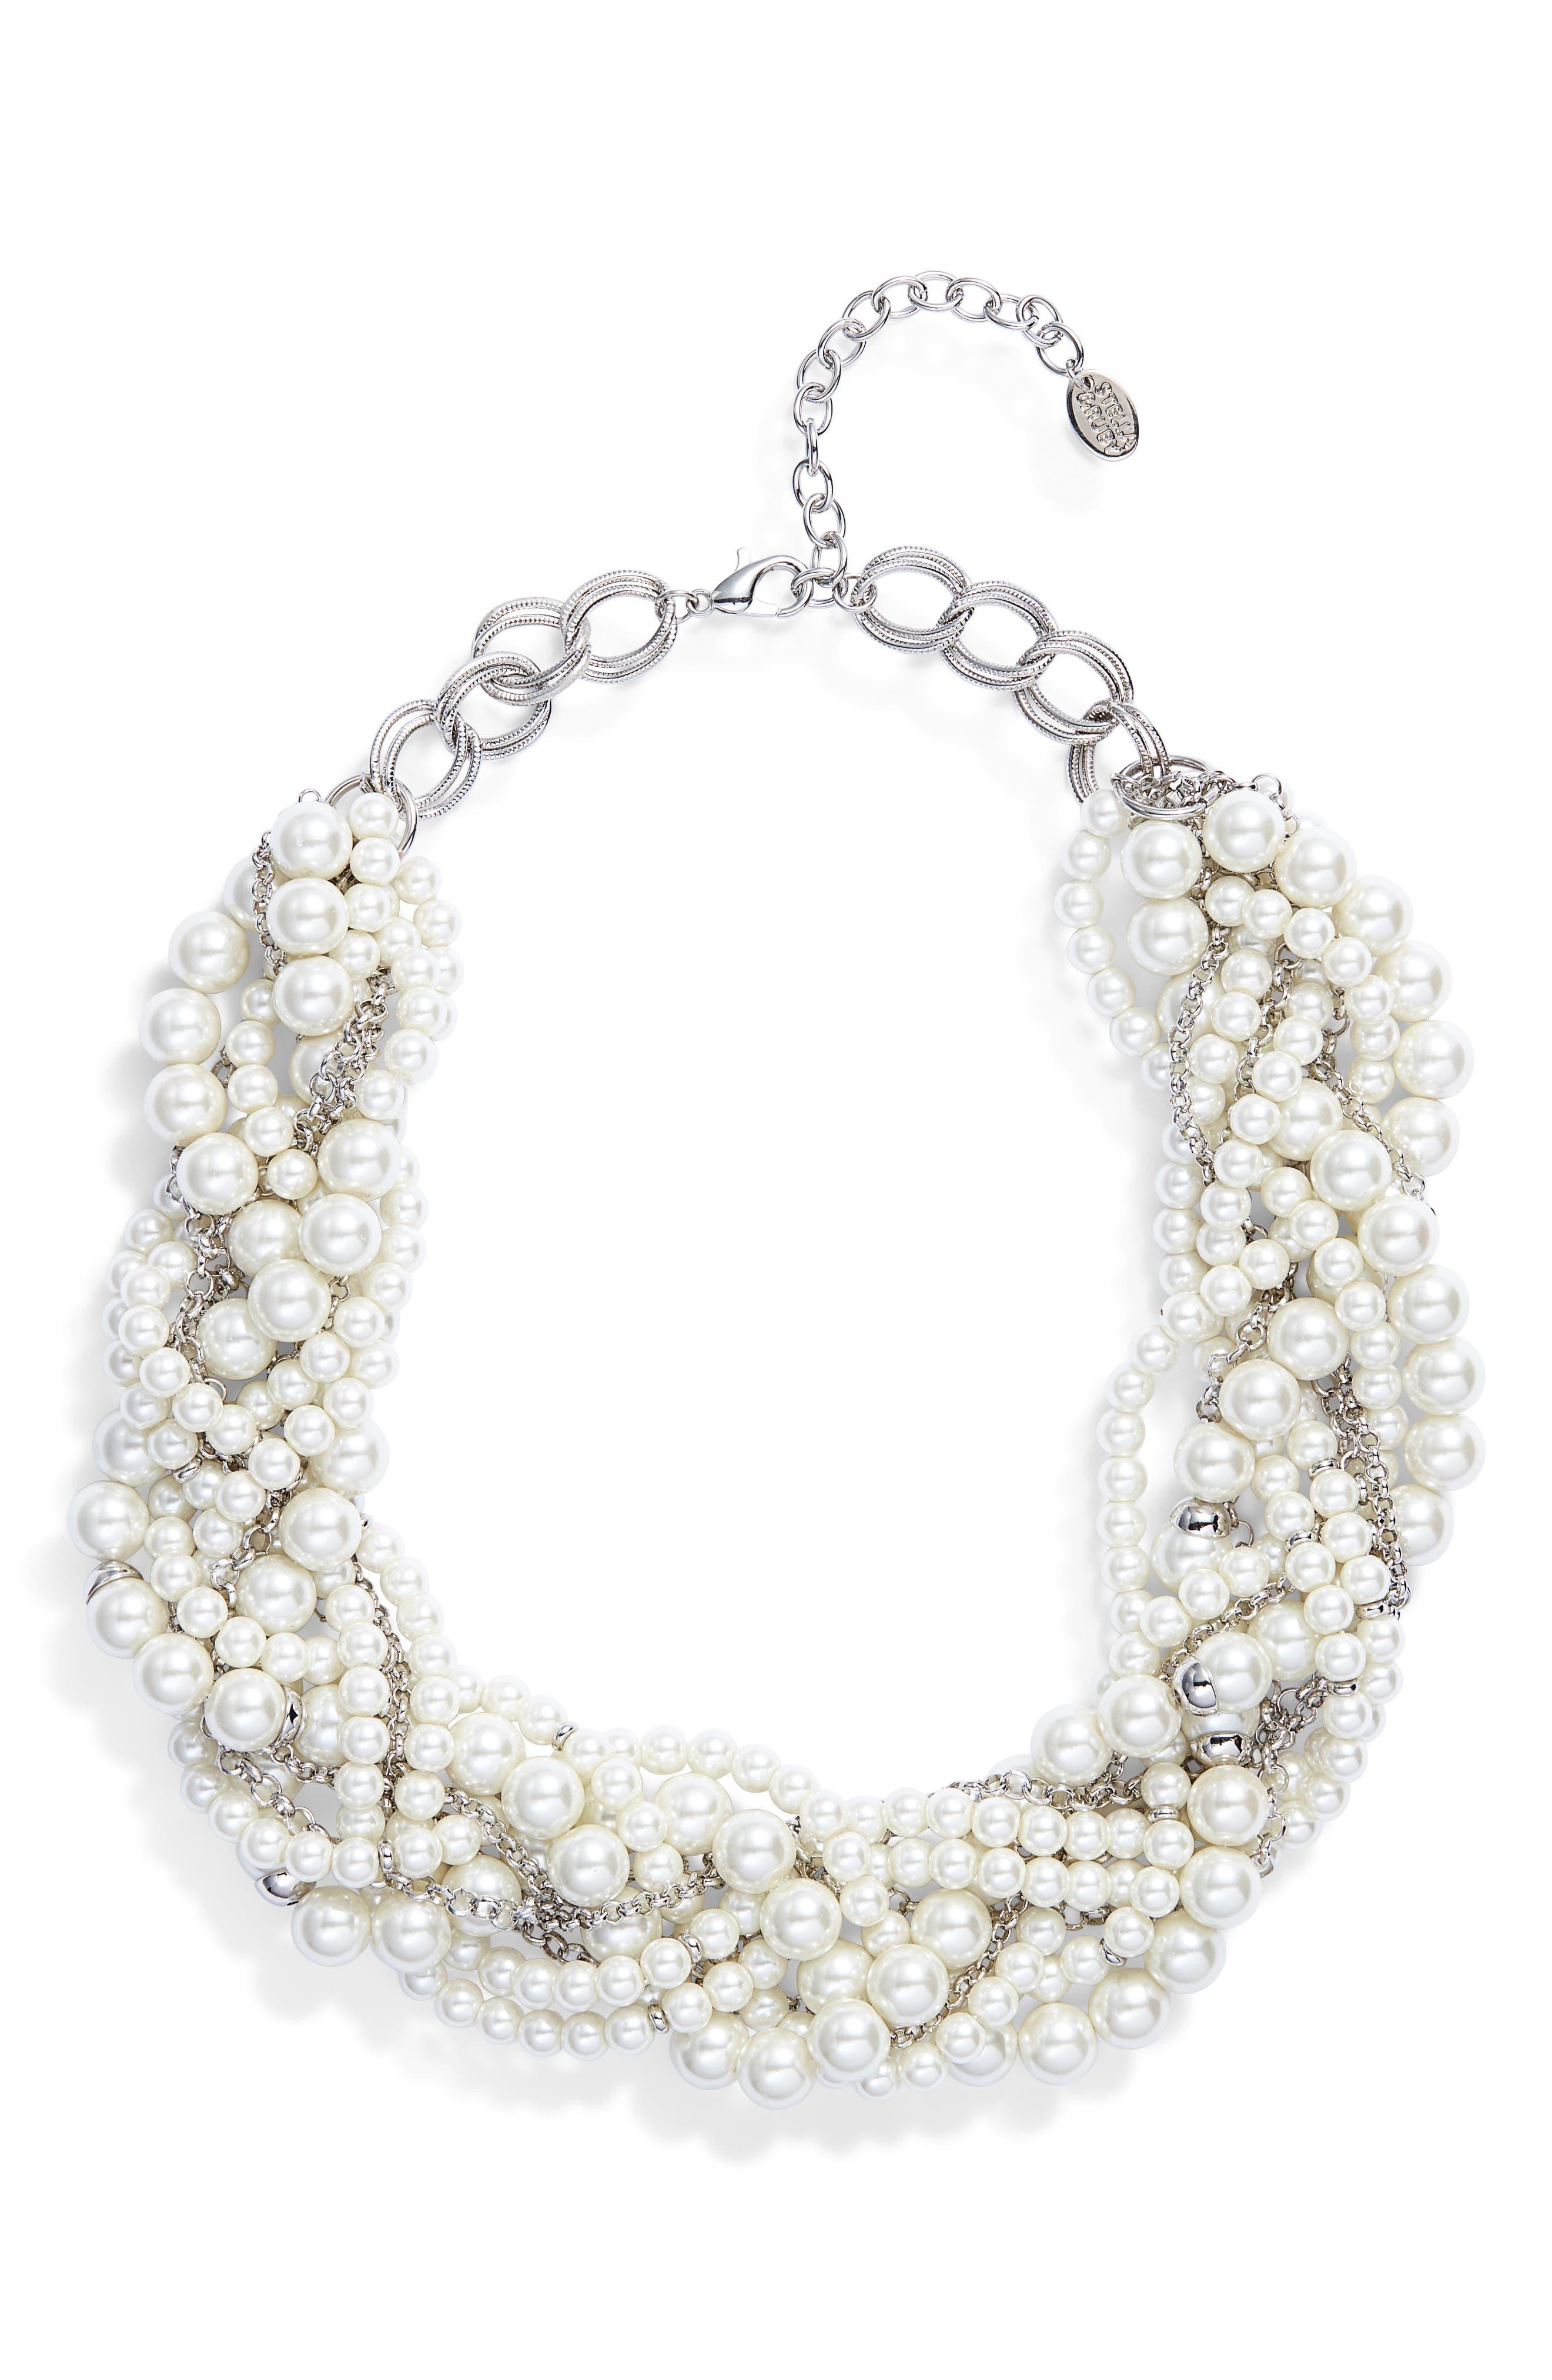 Braided Imitation Pearl Necklace,                             Main thumbnail 1, color,                             040